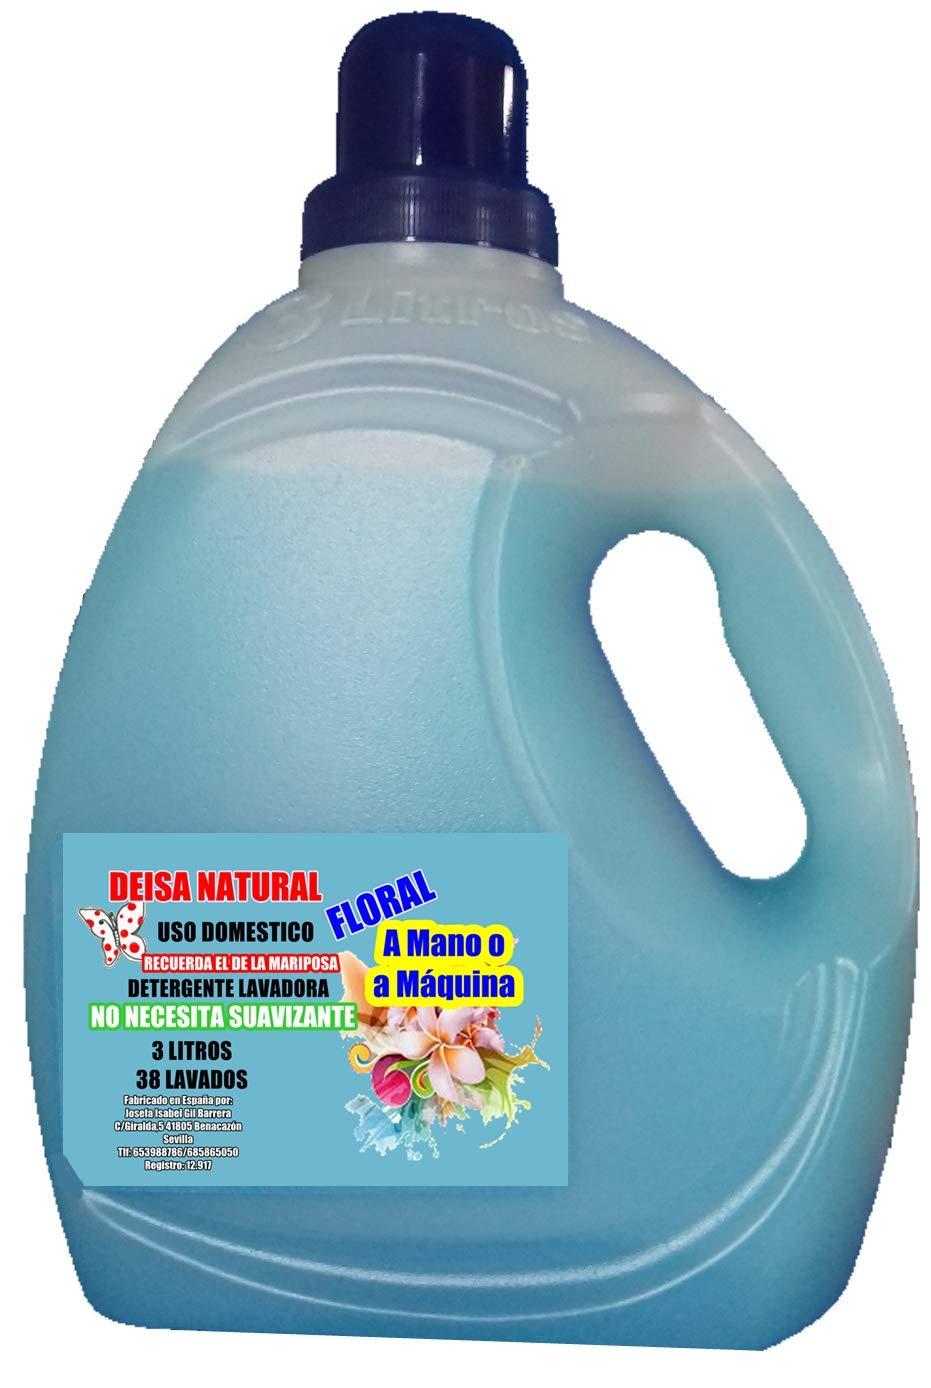 DEISA NATURAL DETERGENTE Natural Lavadora Floral 3 litros 38 ...